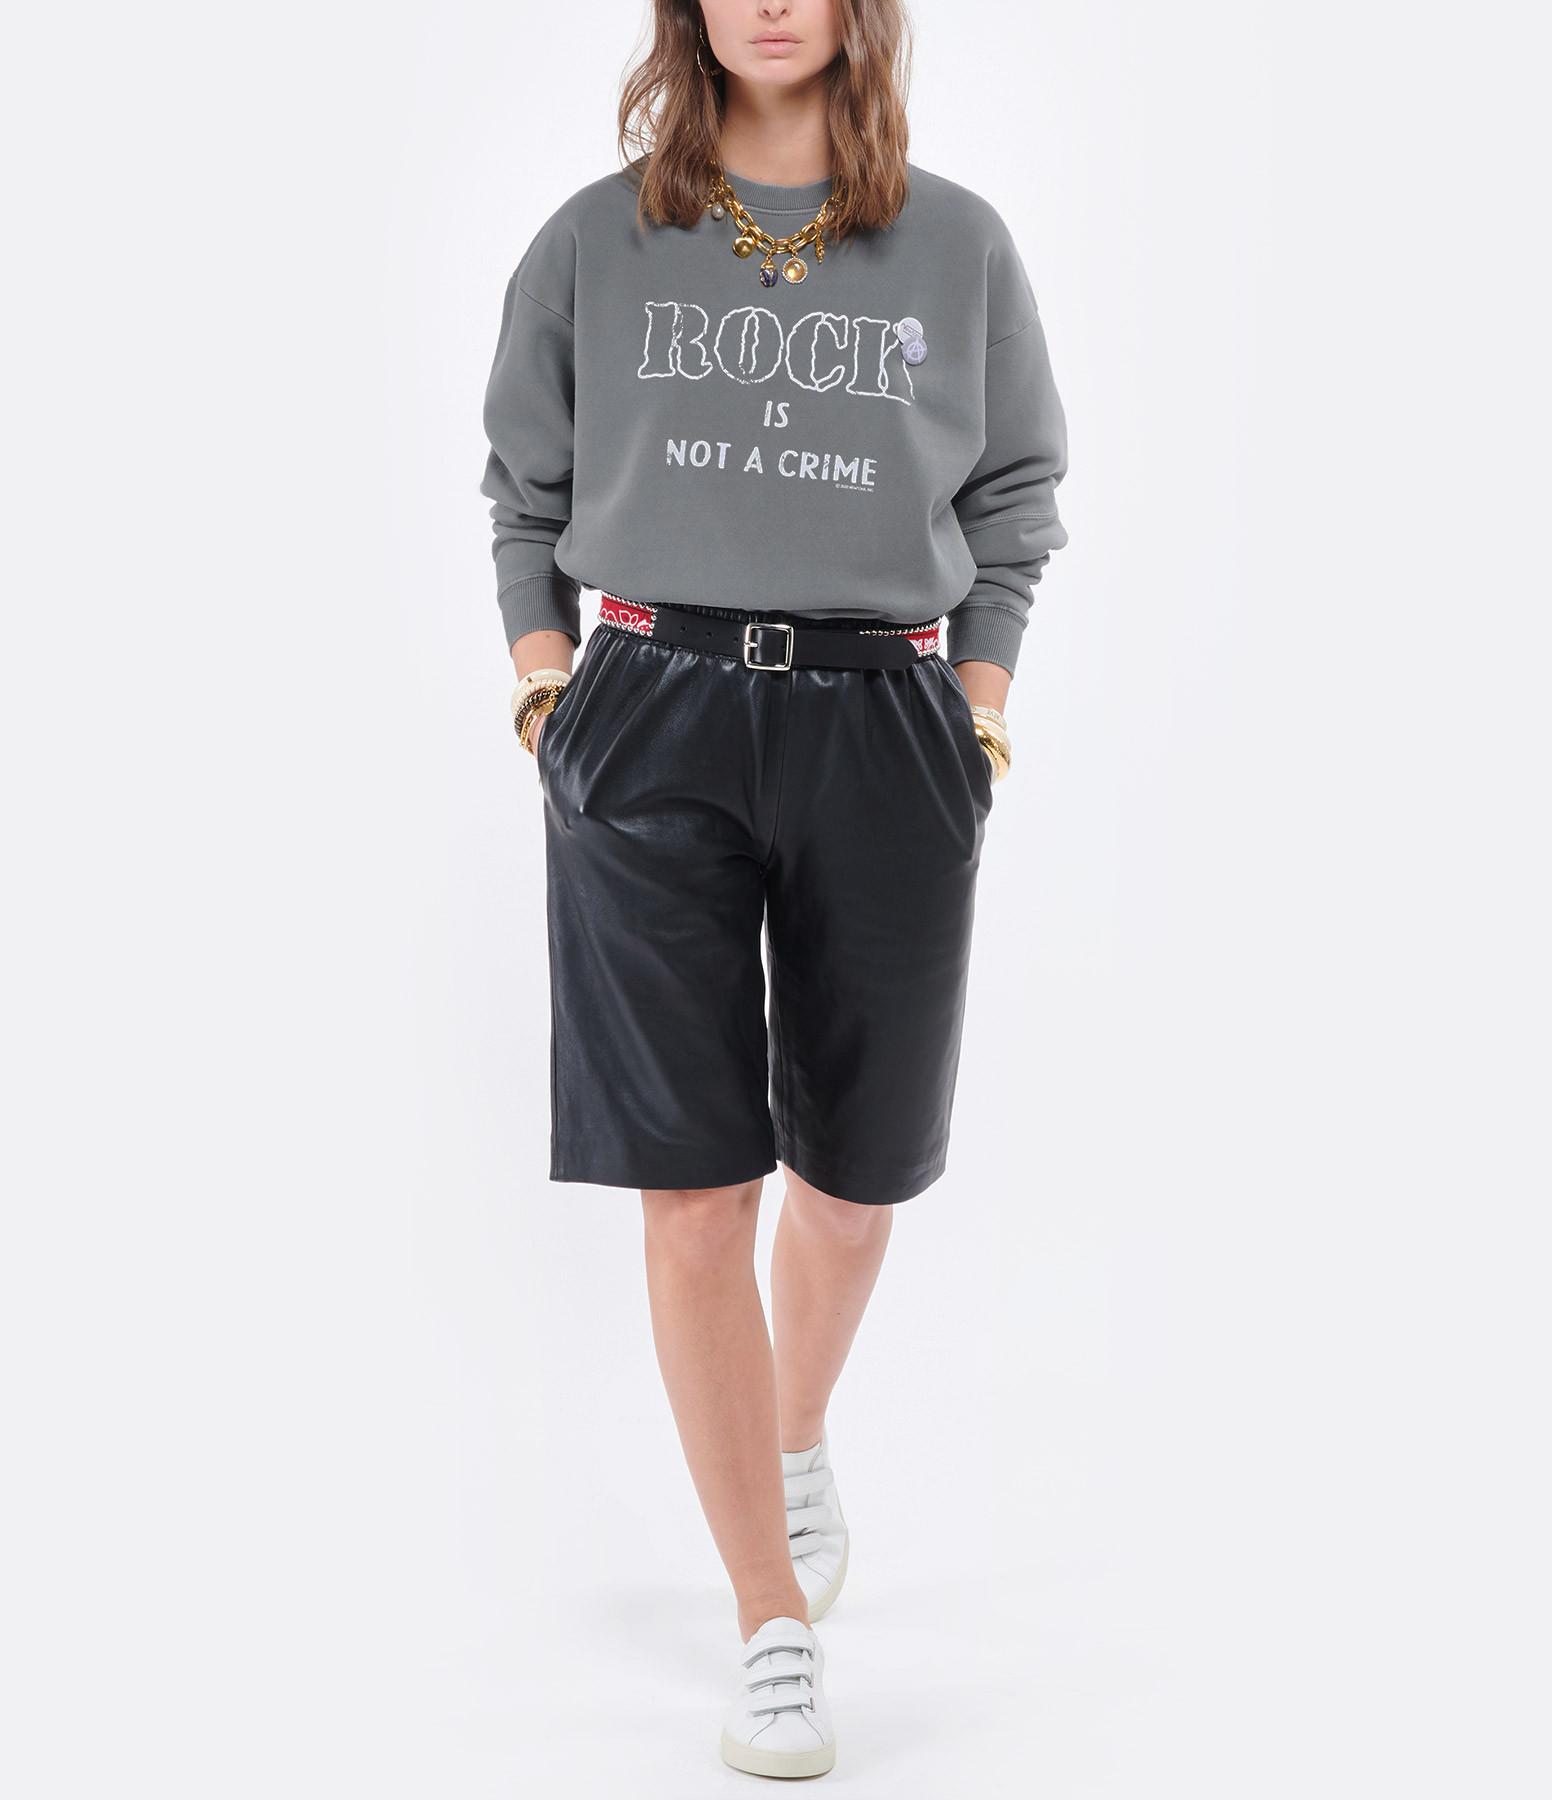 NEWTONE - Sweatshirt Roller Crime Coton Gris